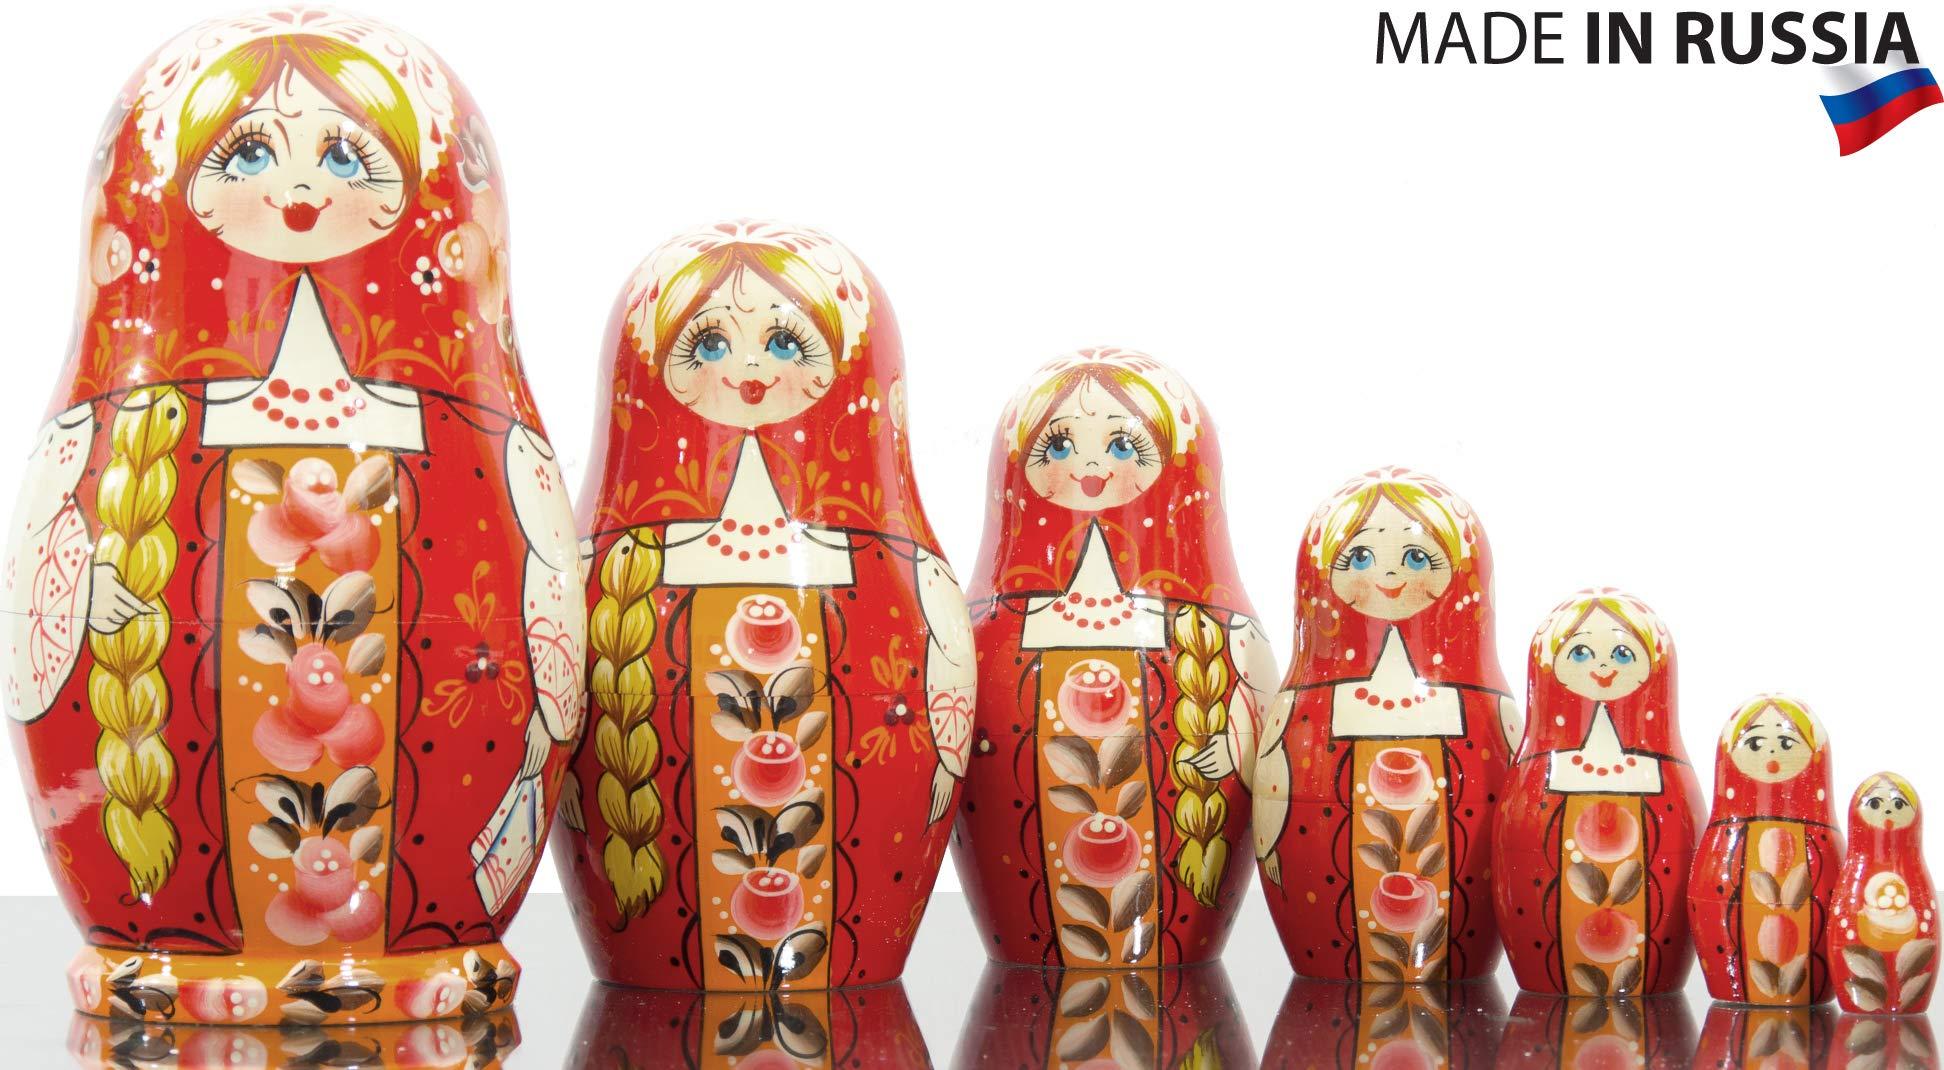 Russian Nesting Doll - Kirov - VJATKA - Hand Painted in Russia - Medium Size - Wooden Decoration Gift Doll - Matryoshka Babushka (Design A, 6.5``(7 Dolls in 1))